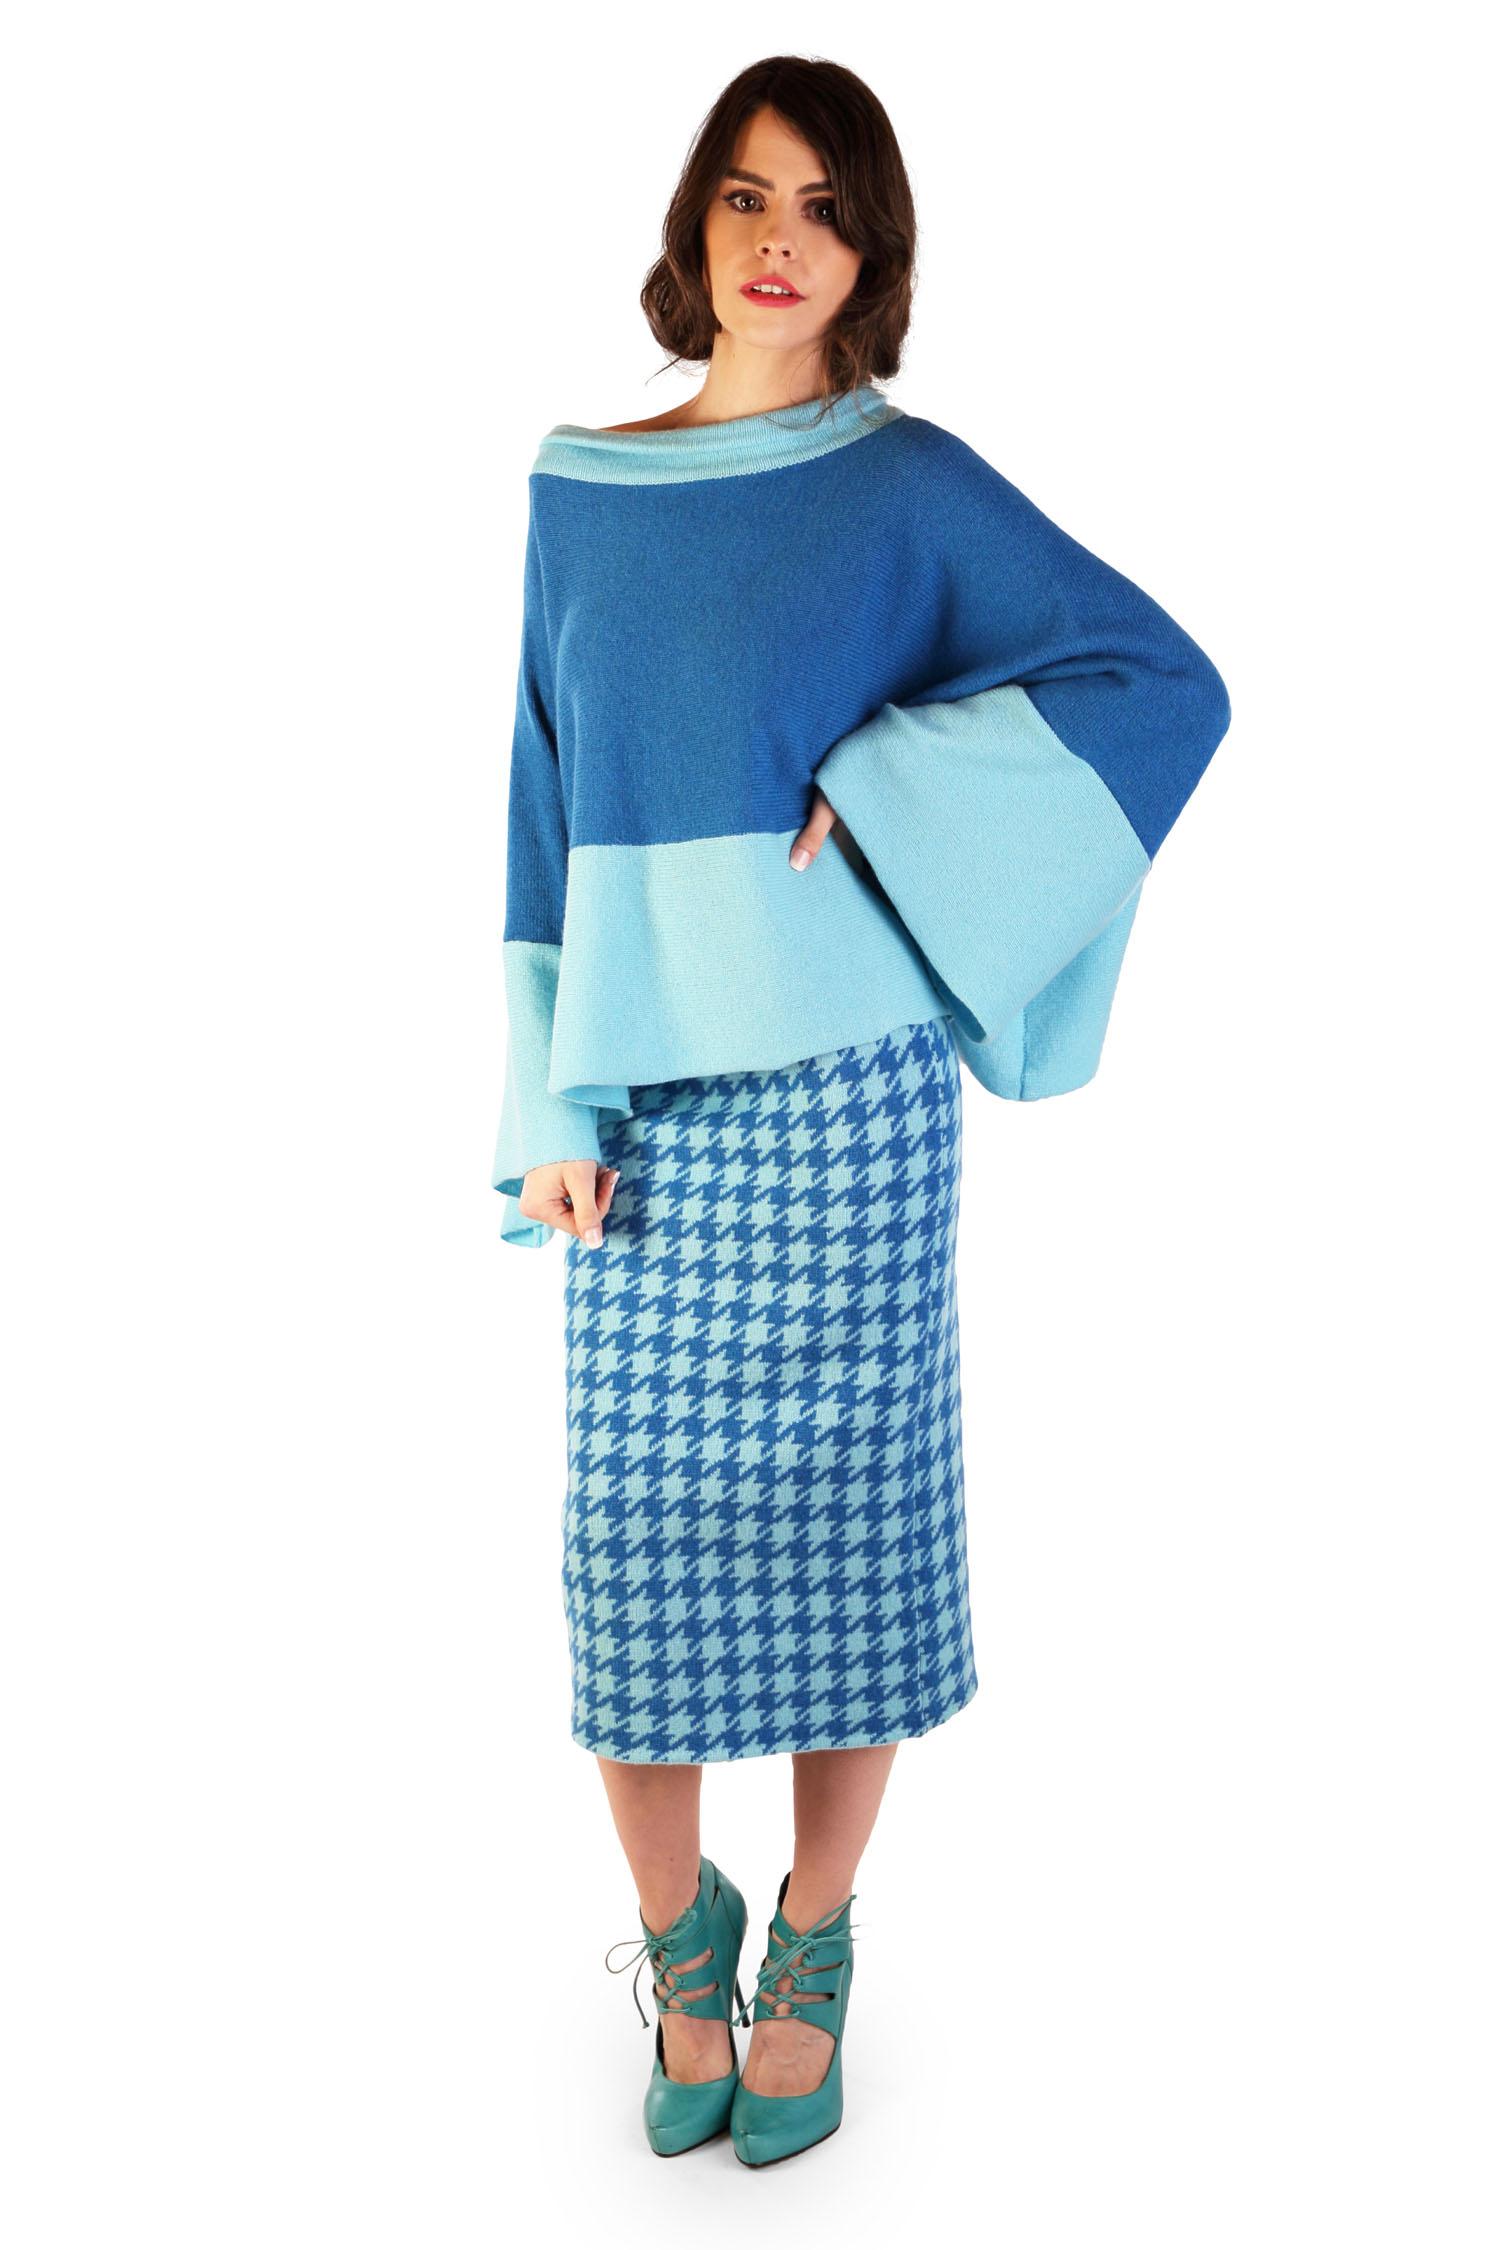 Dogtooth pencil skirt3